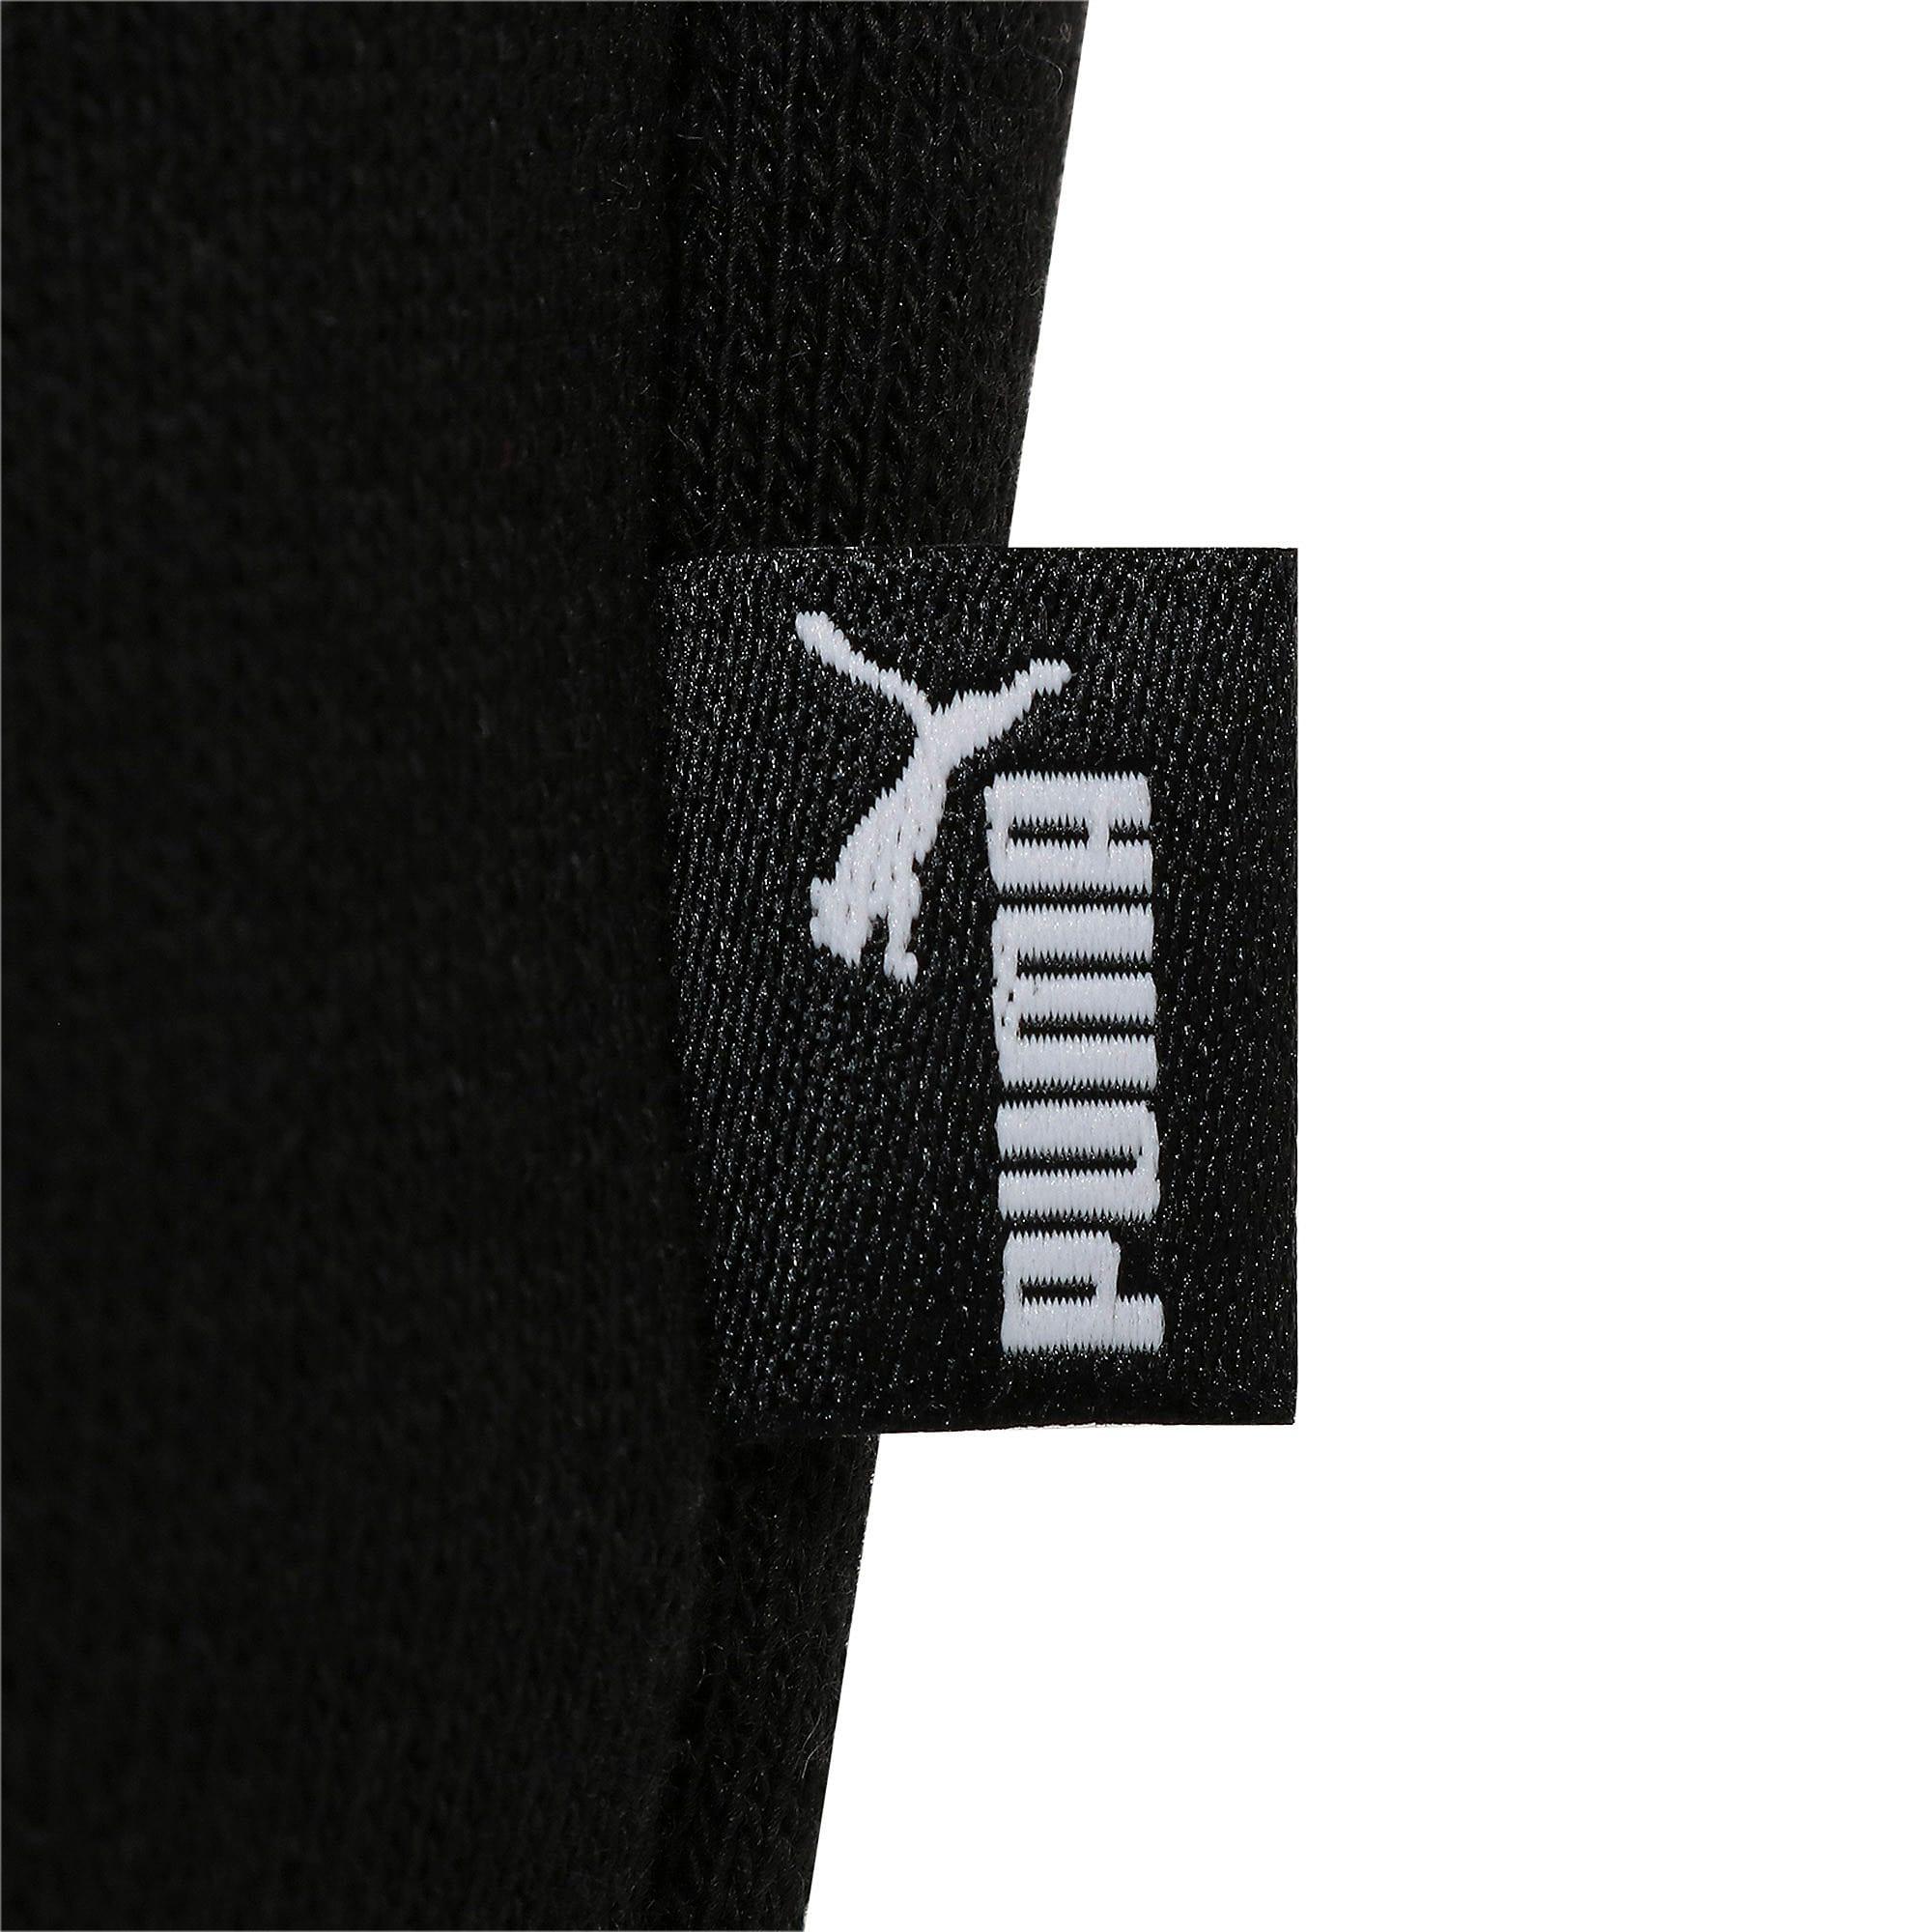 Thumbnail 4 of キッズ REBEL ボールド フルジップTR, Puma Black, medium-JPN